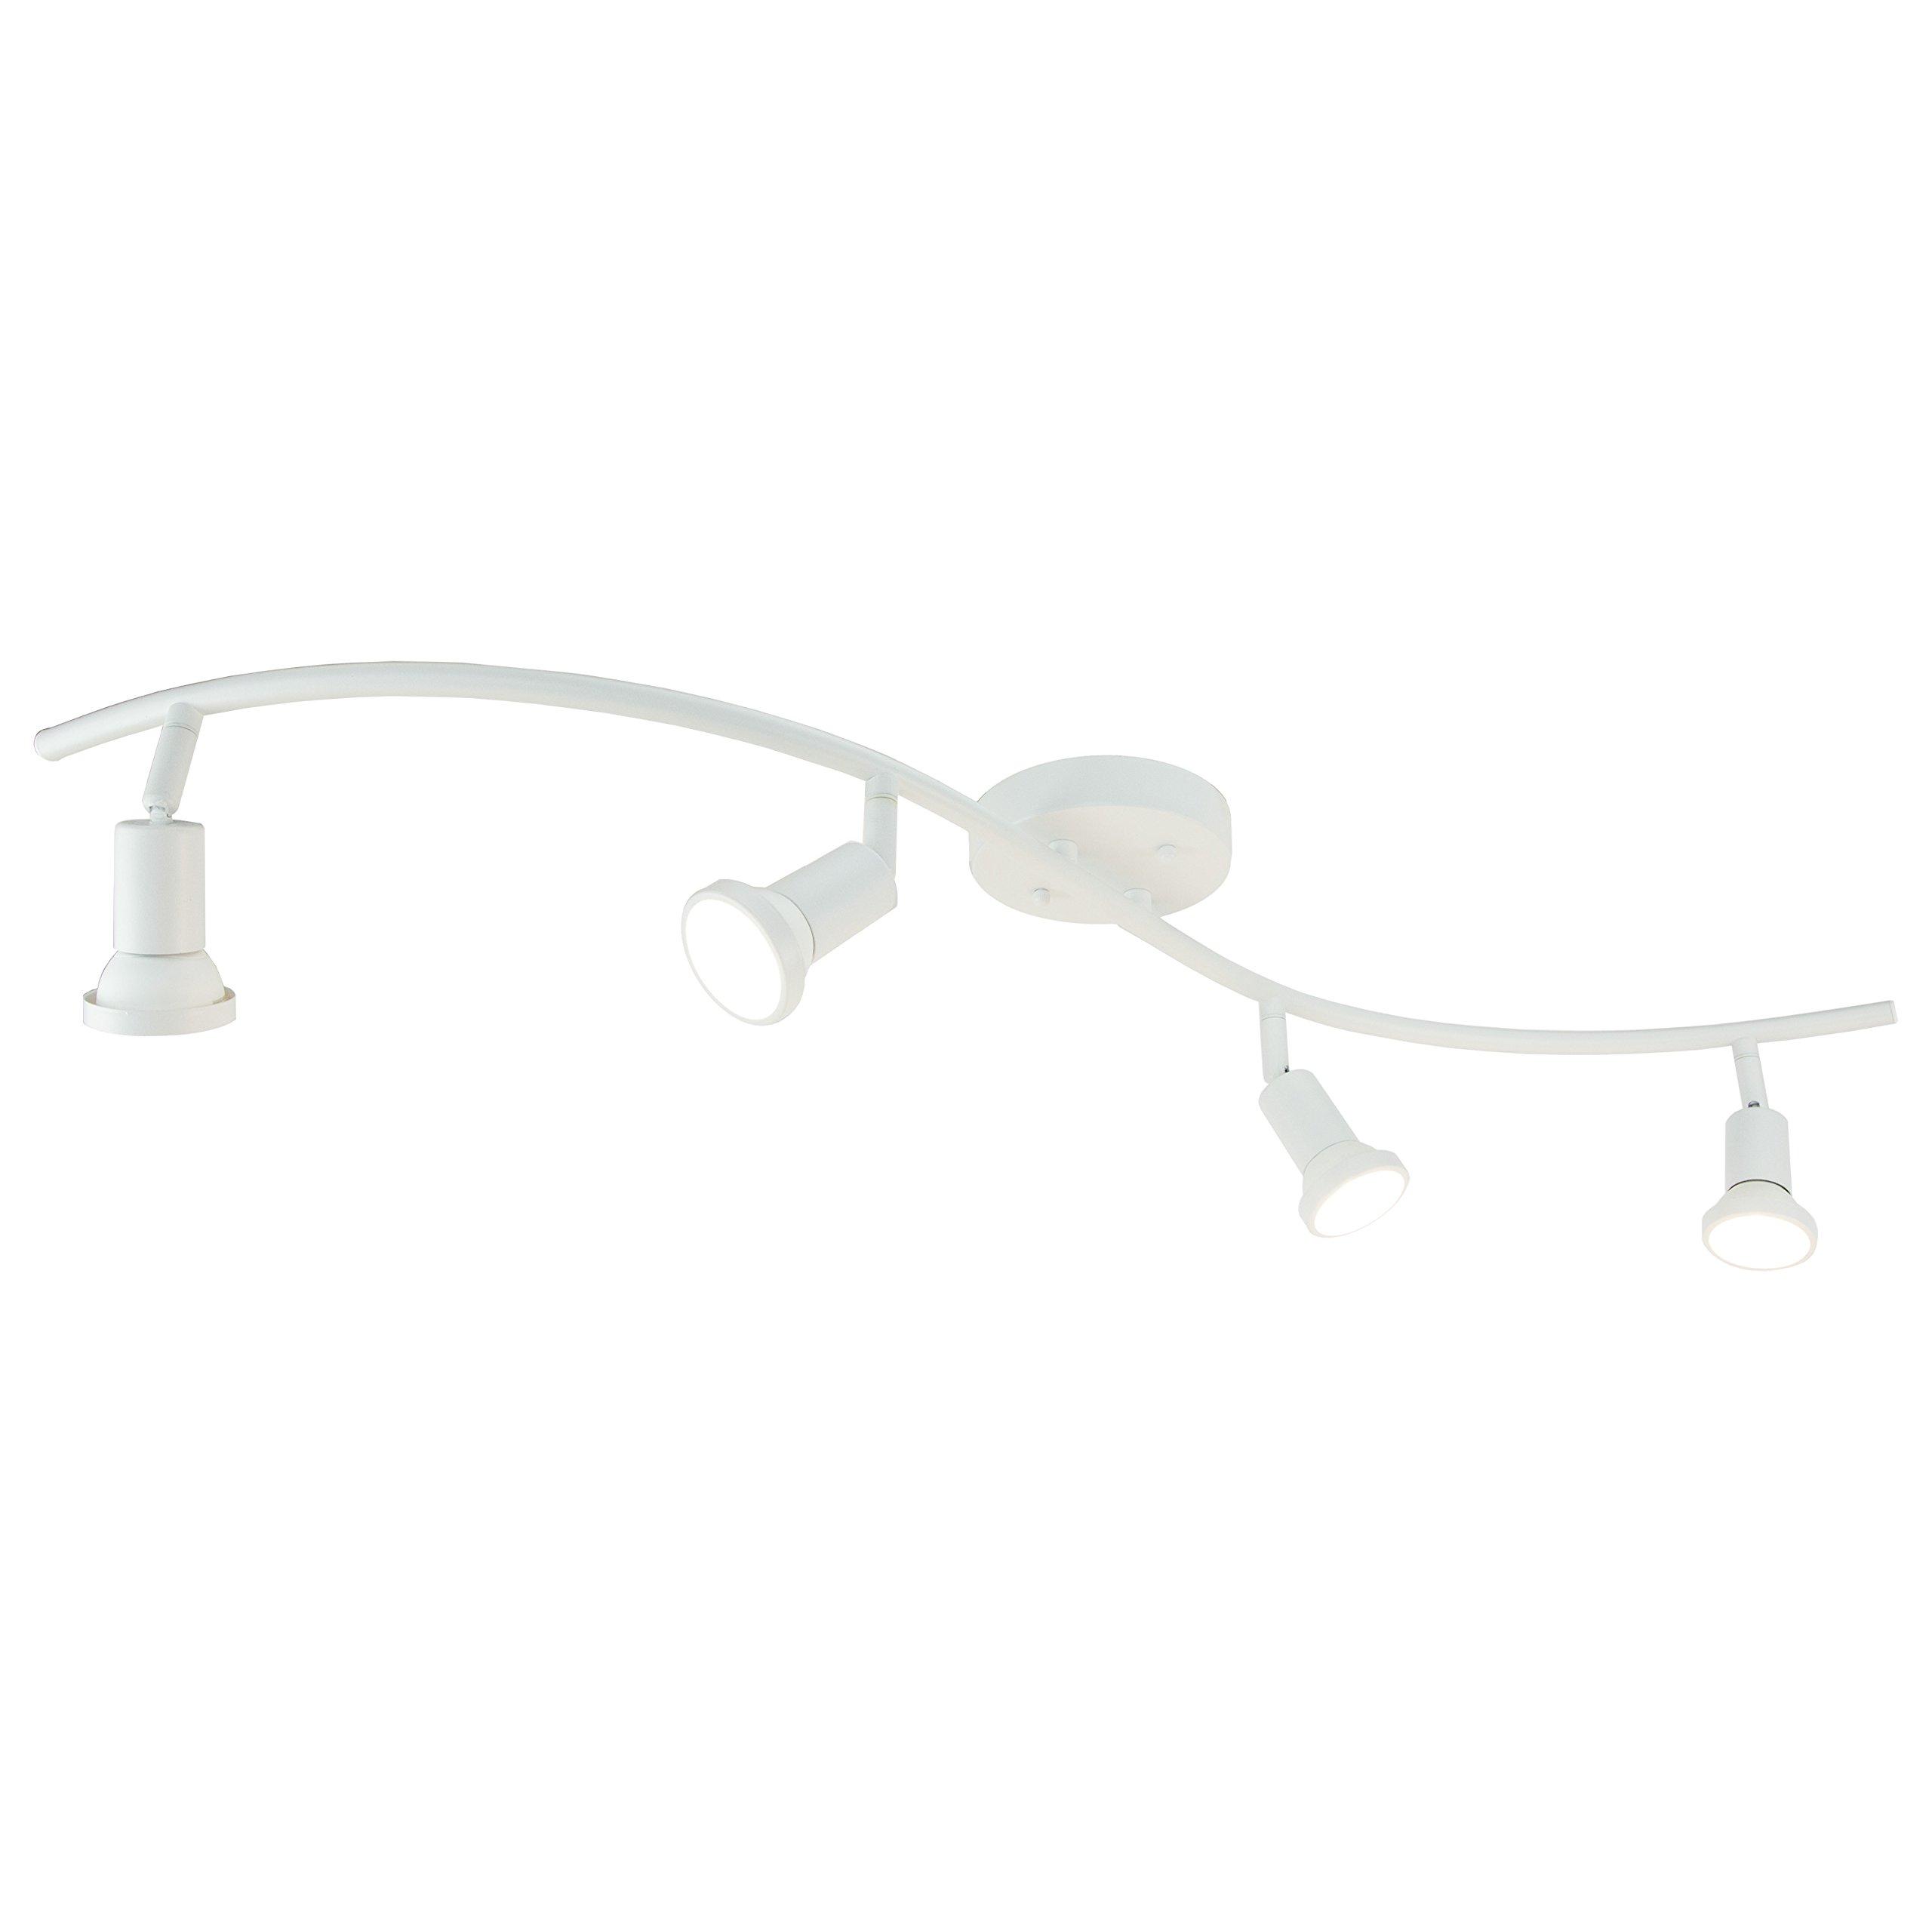 DnD 4-Light Adjustable LED Track Lighting Kit - Curved - GU10 LED Bulbs Included. CE20014-LED-WS (White LED)